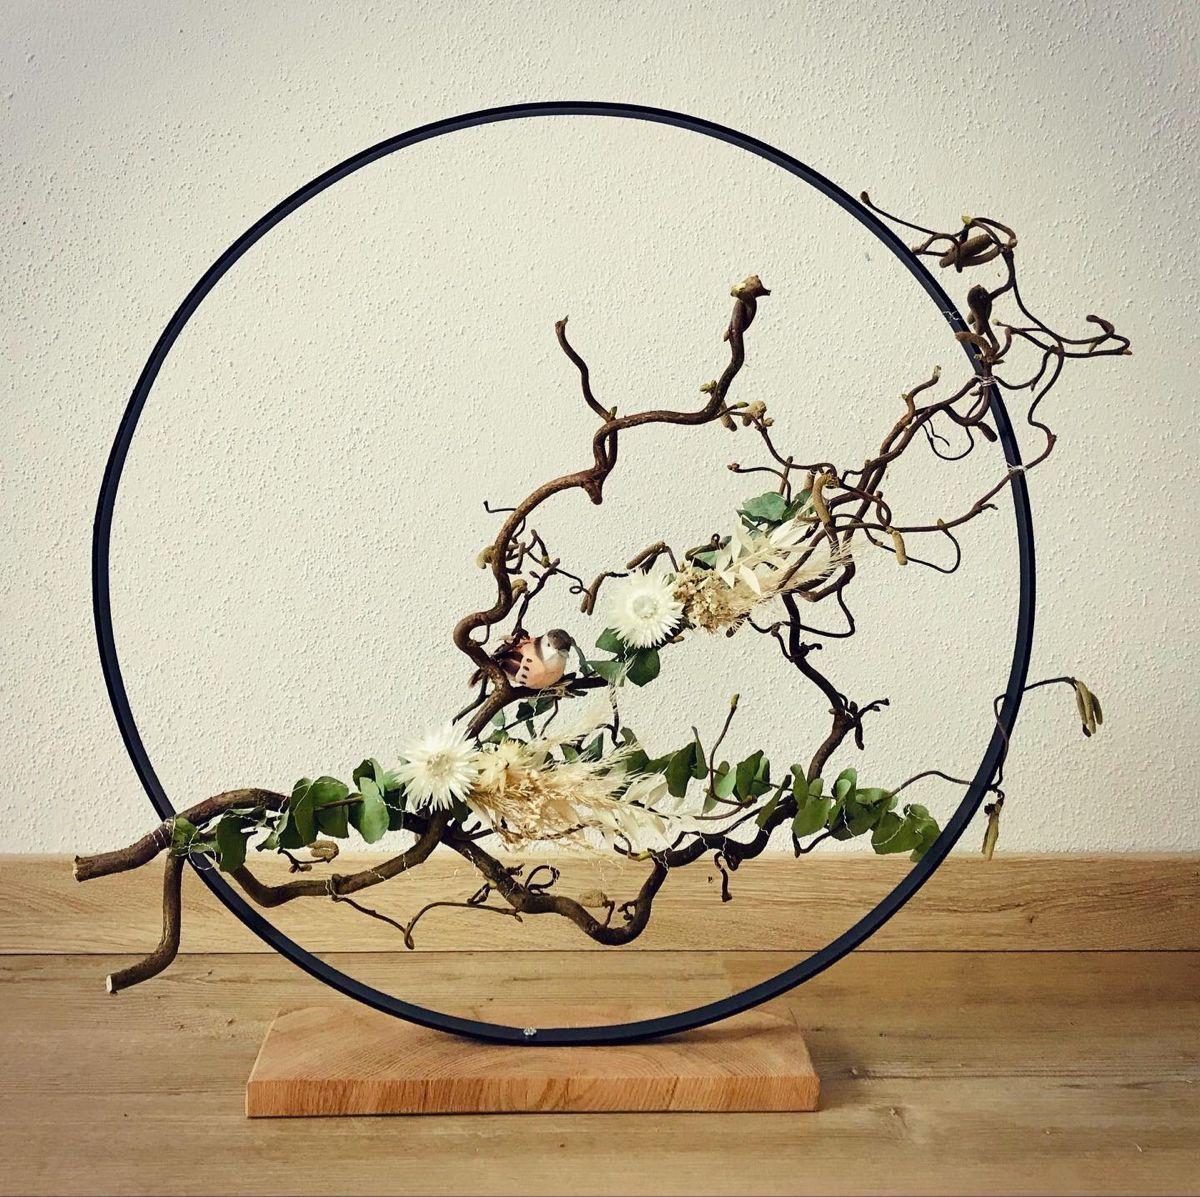 Dekoring (Loop Wreath) mit Trockenblumen